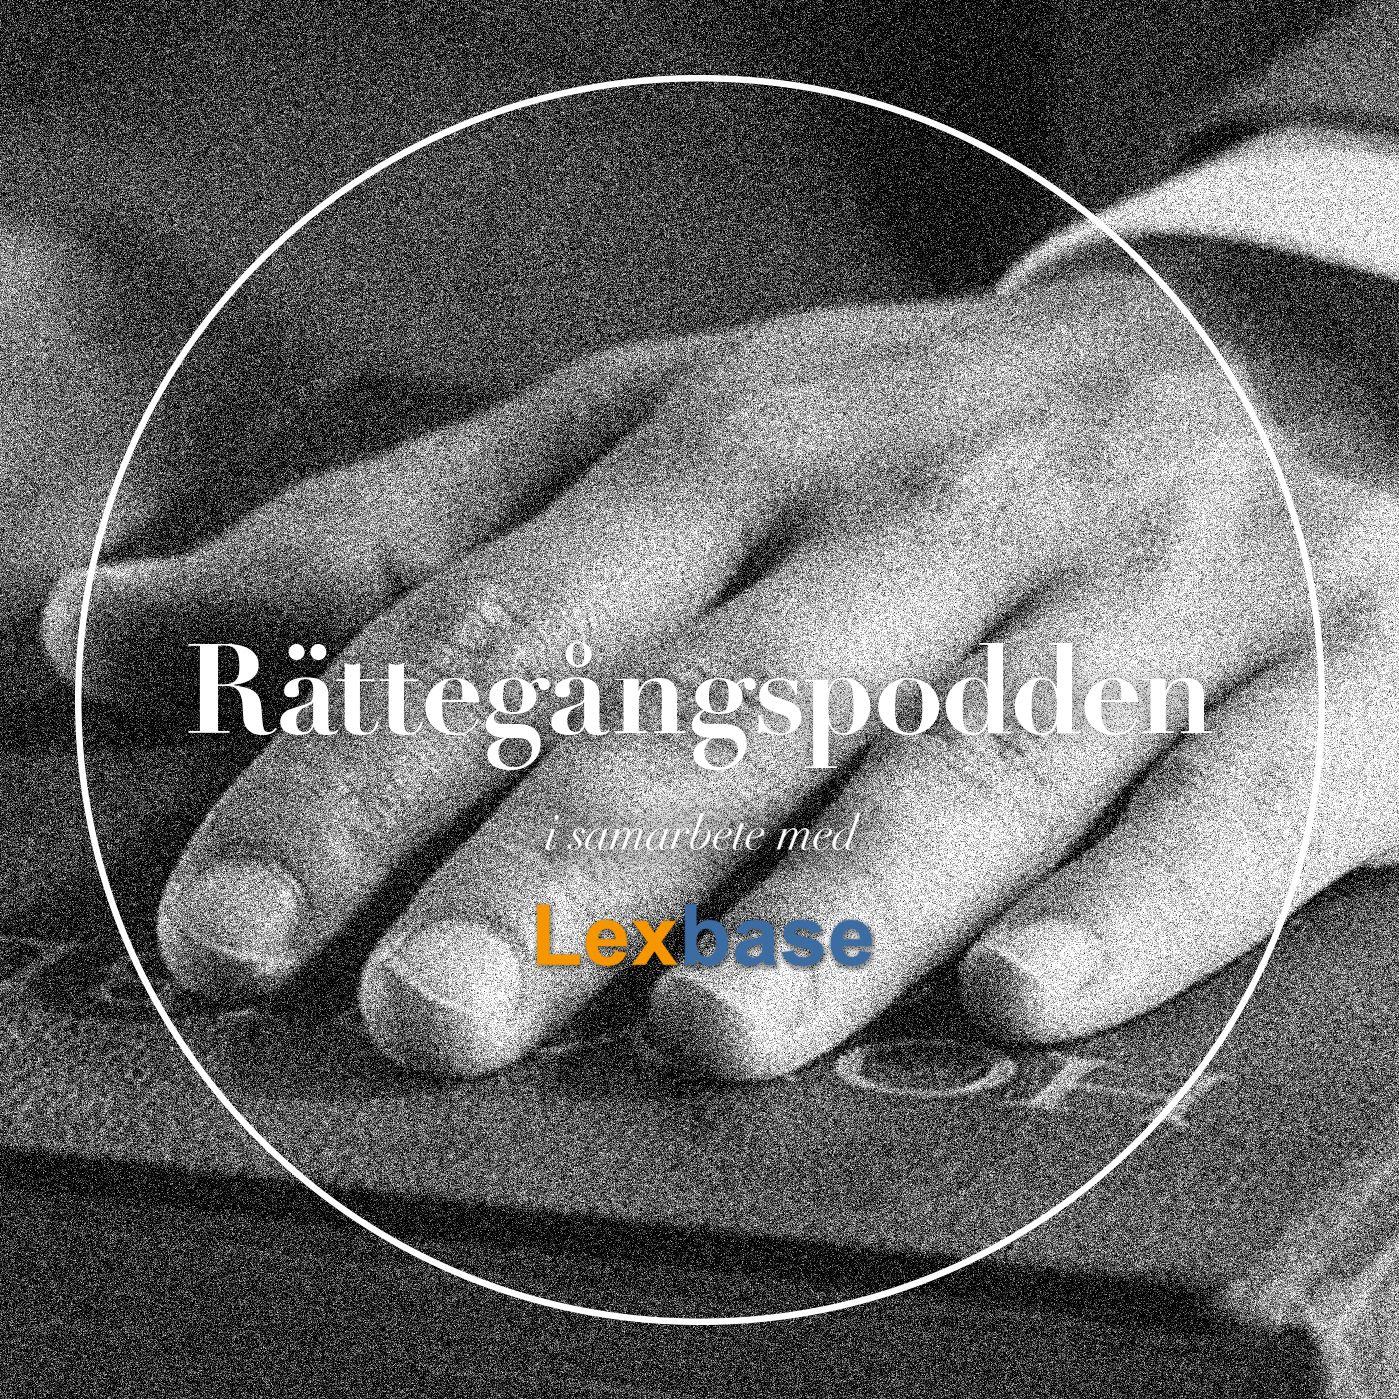 S04E02 Fallet Tova Moberg - Del 2/2